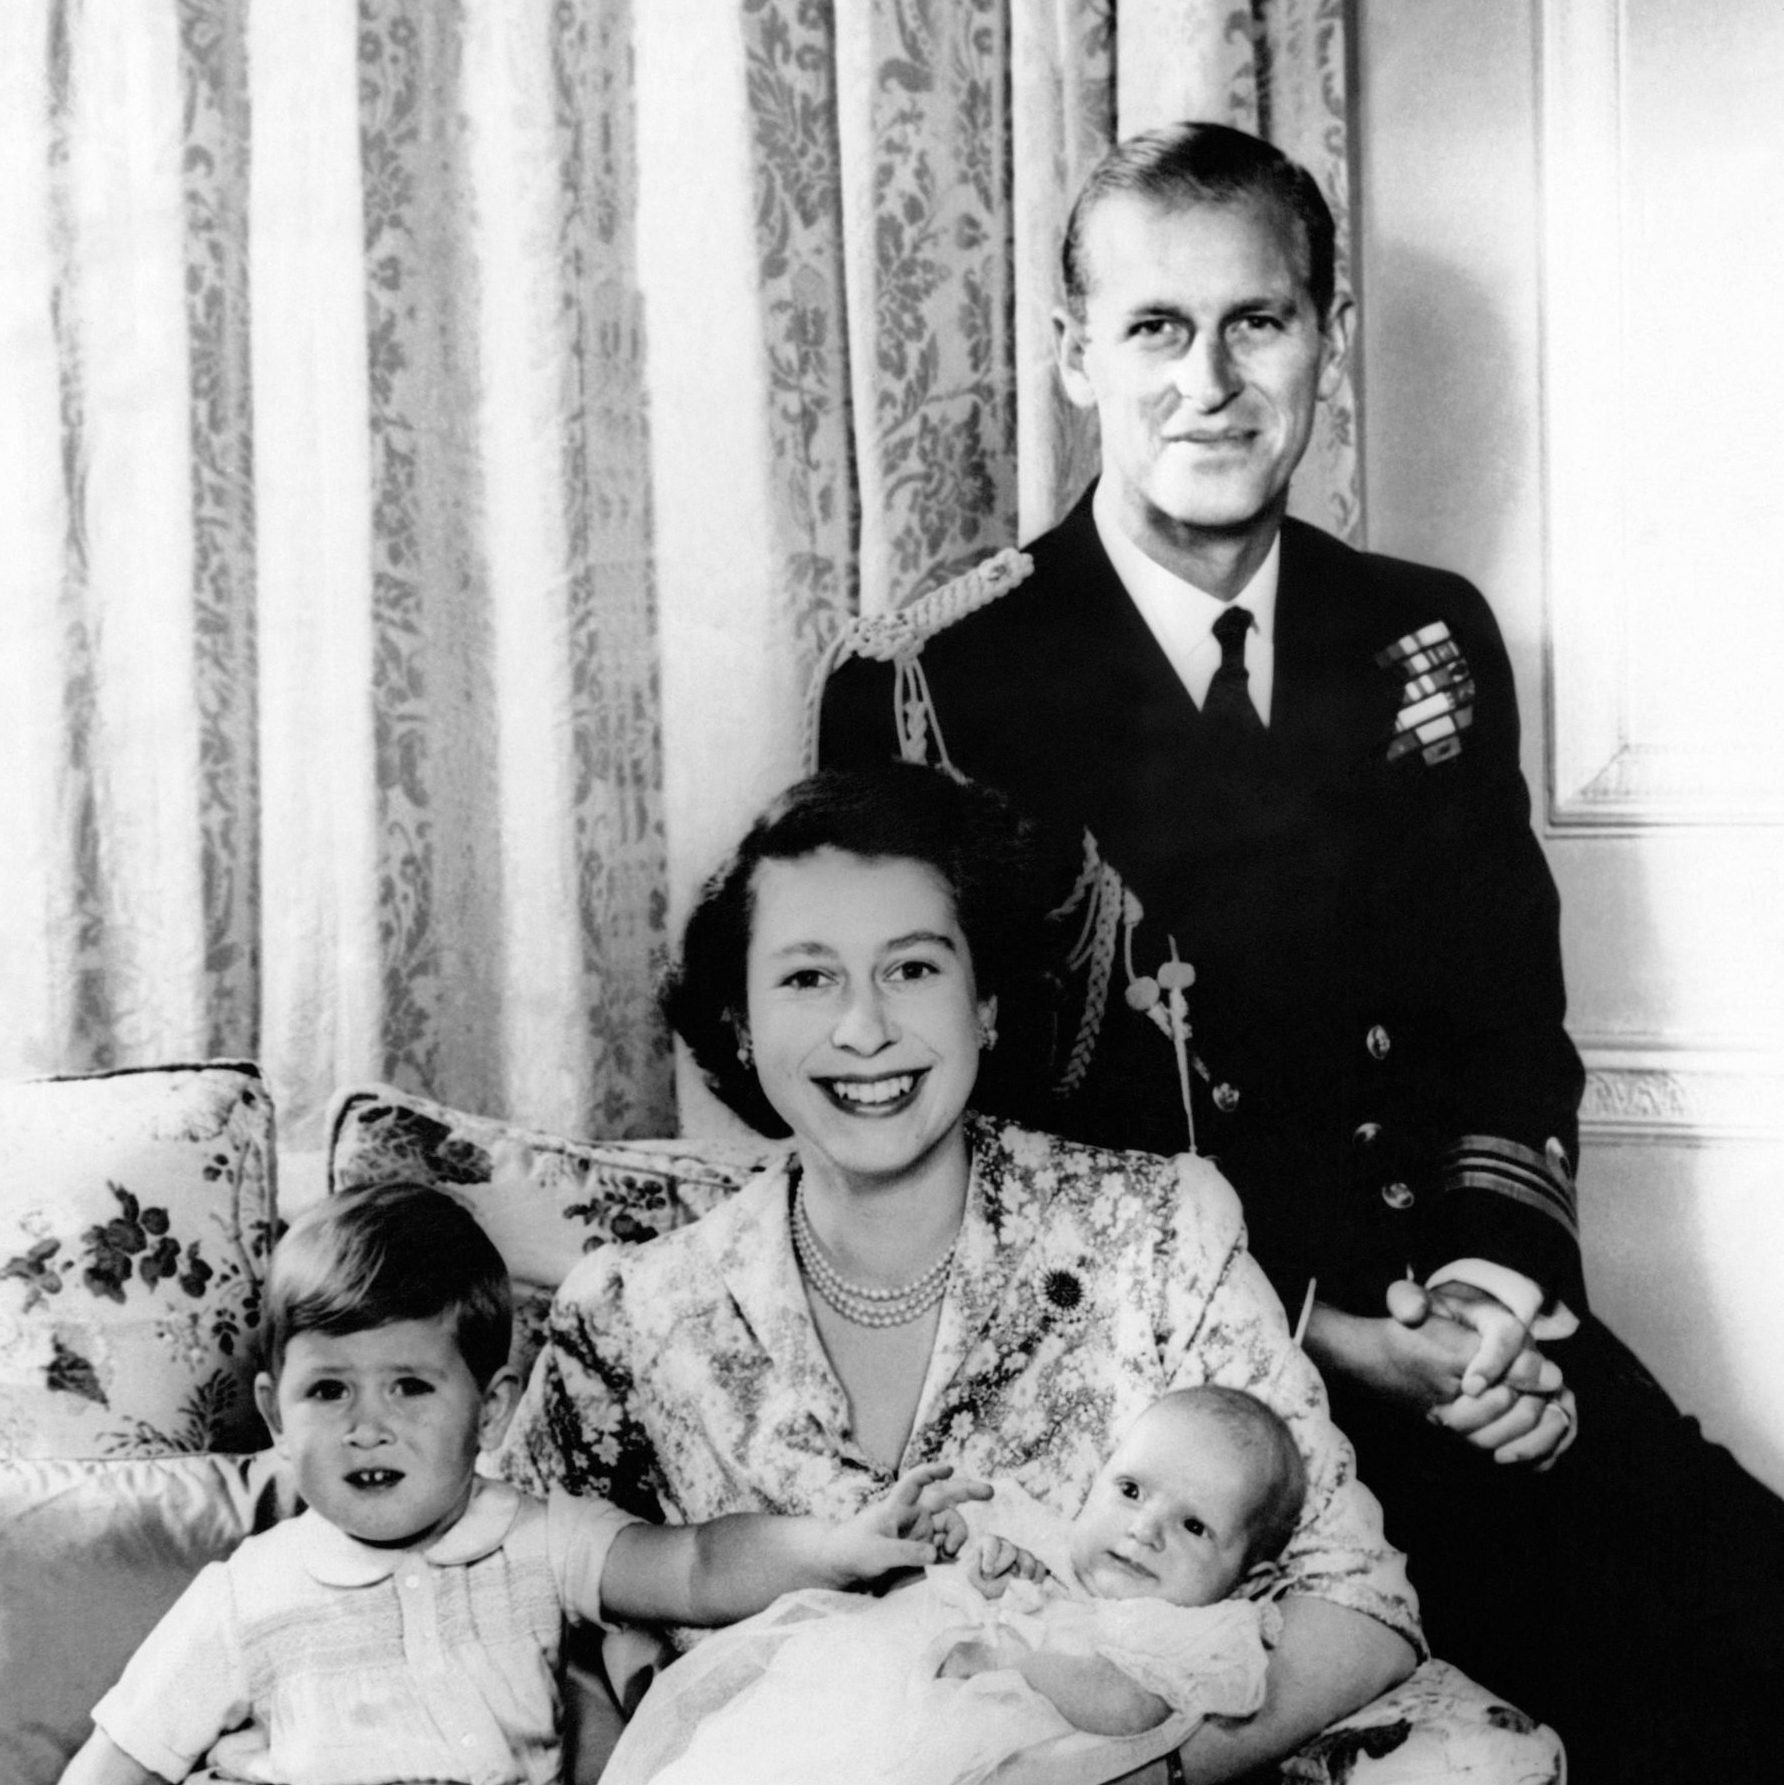 The birth of Princess Anne